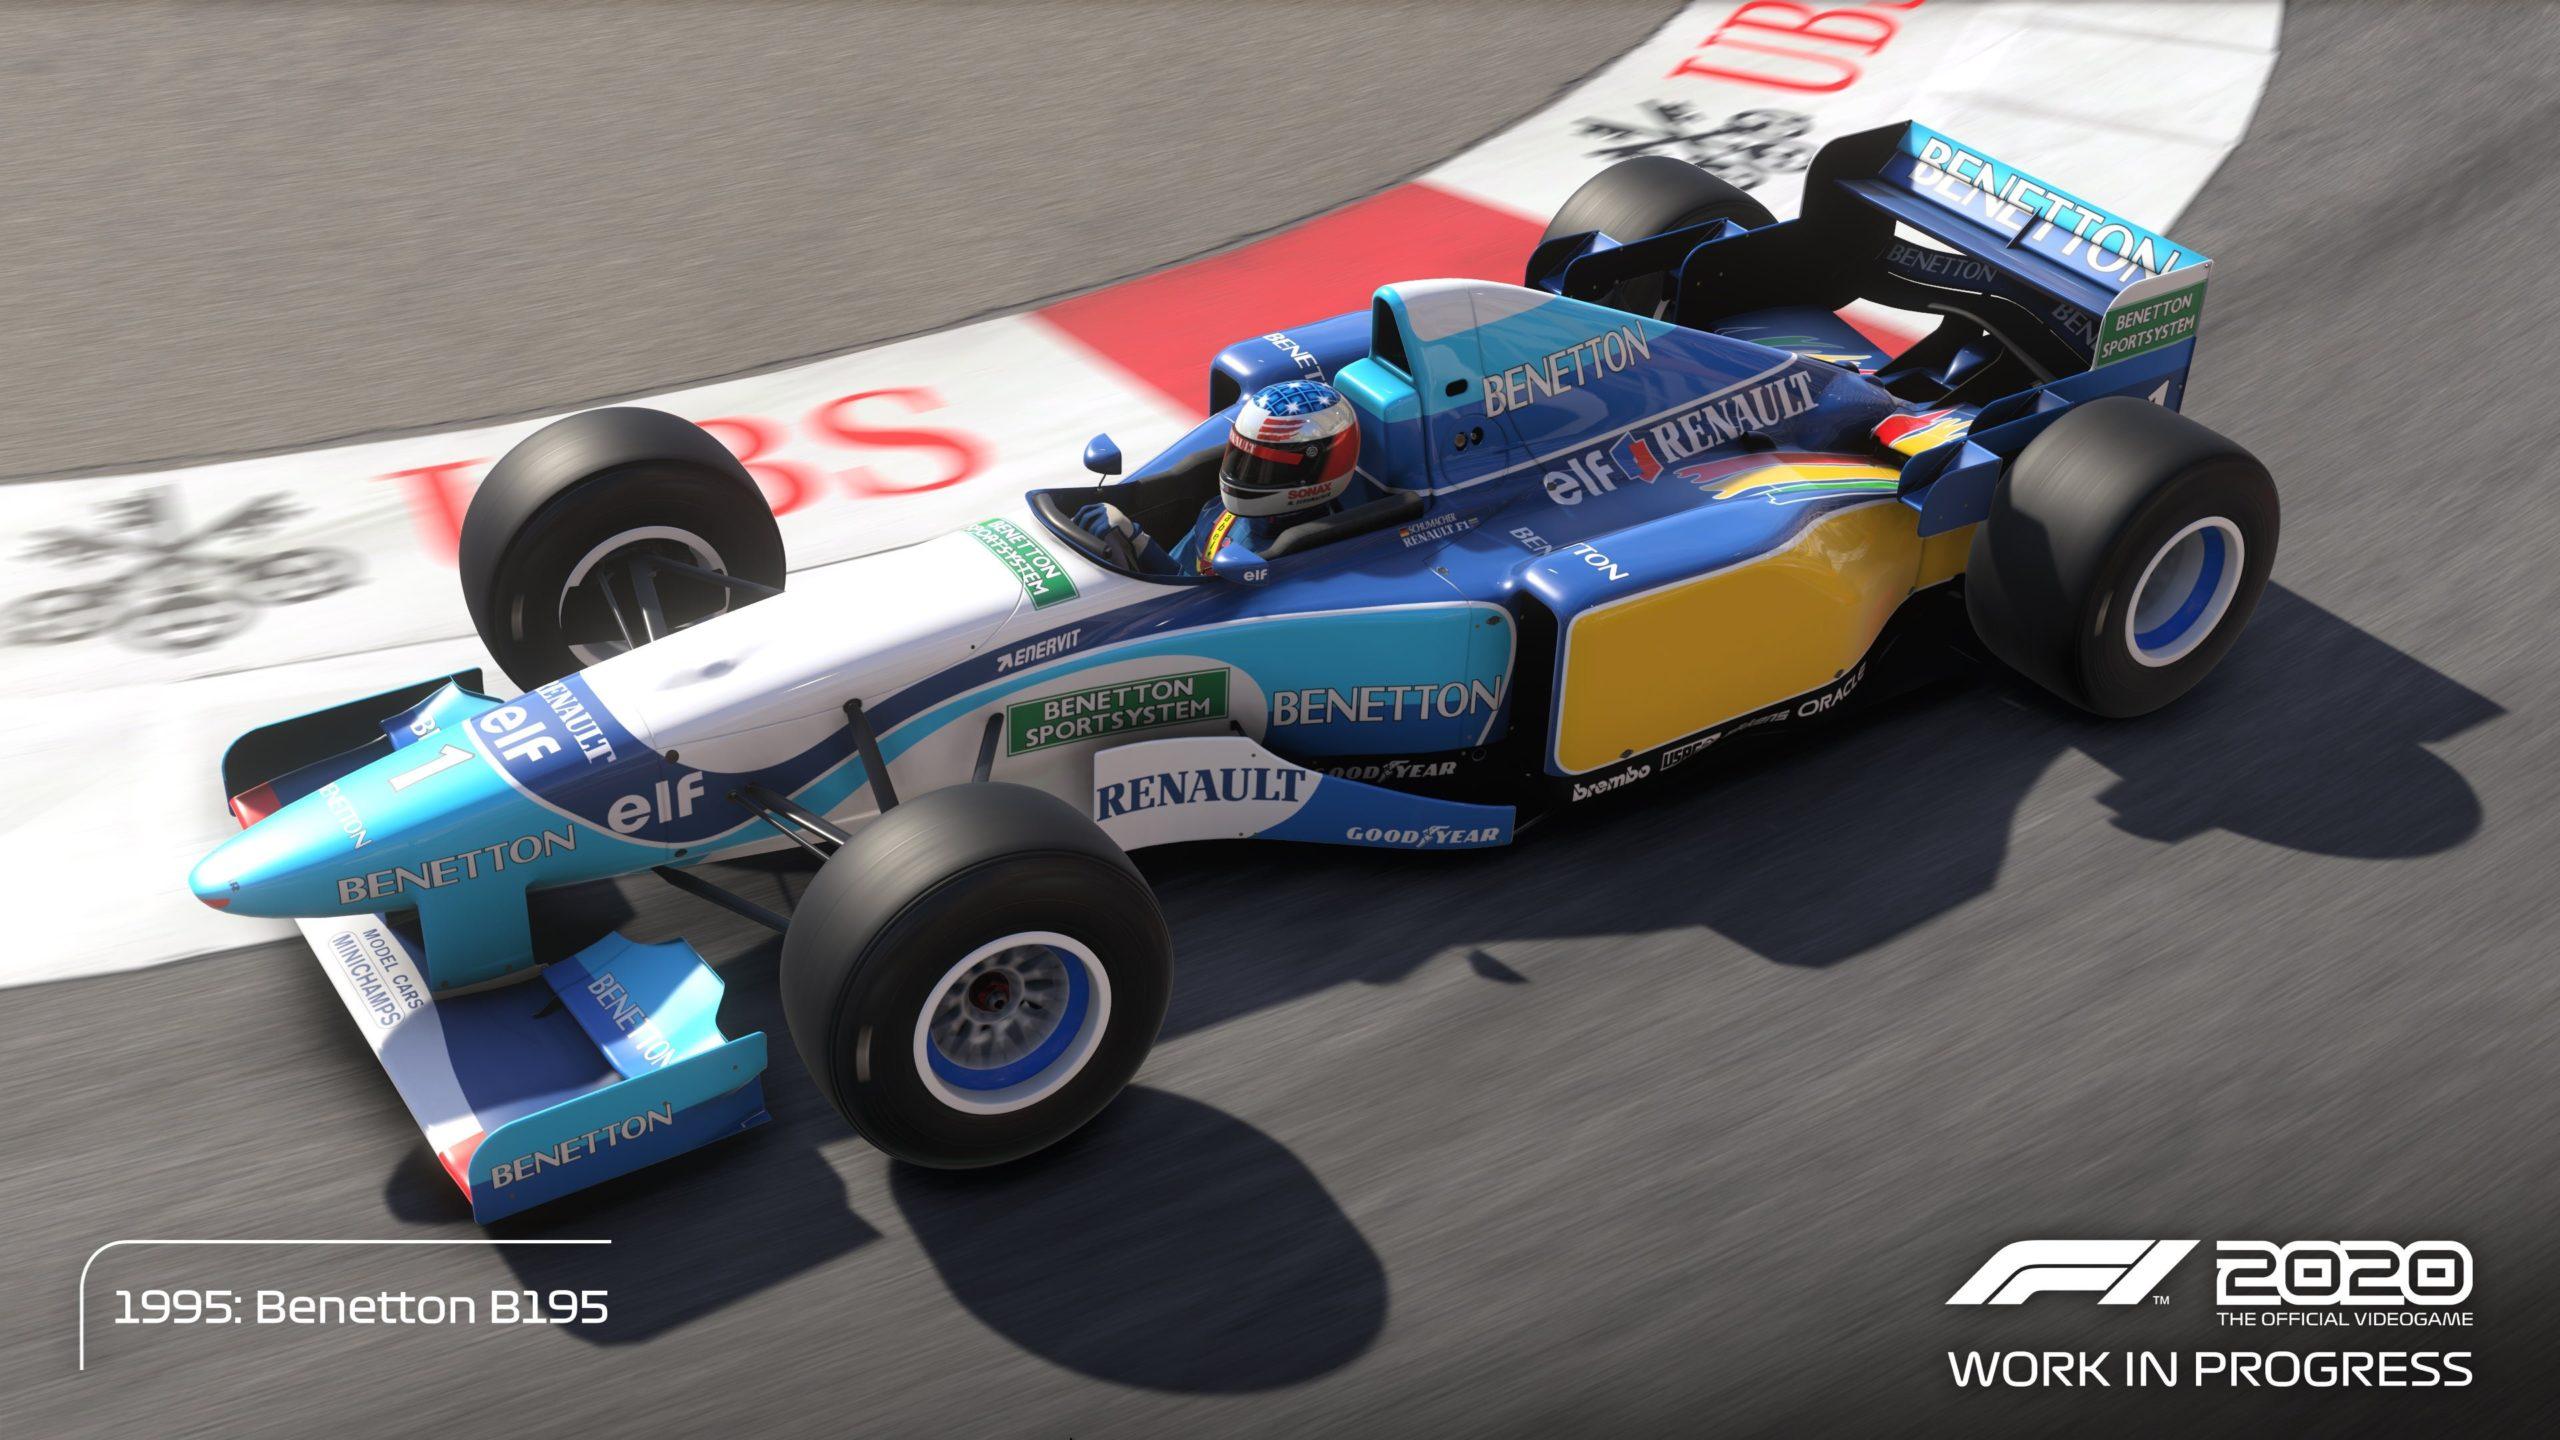 F1 2020 - Michael Schumacher Edition Previews | VirtualR ...